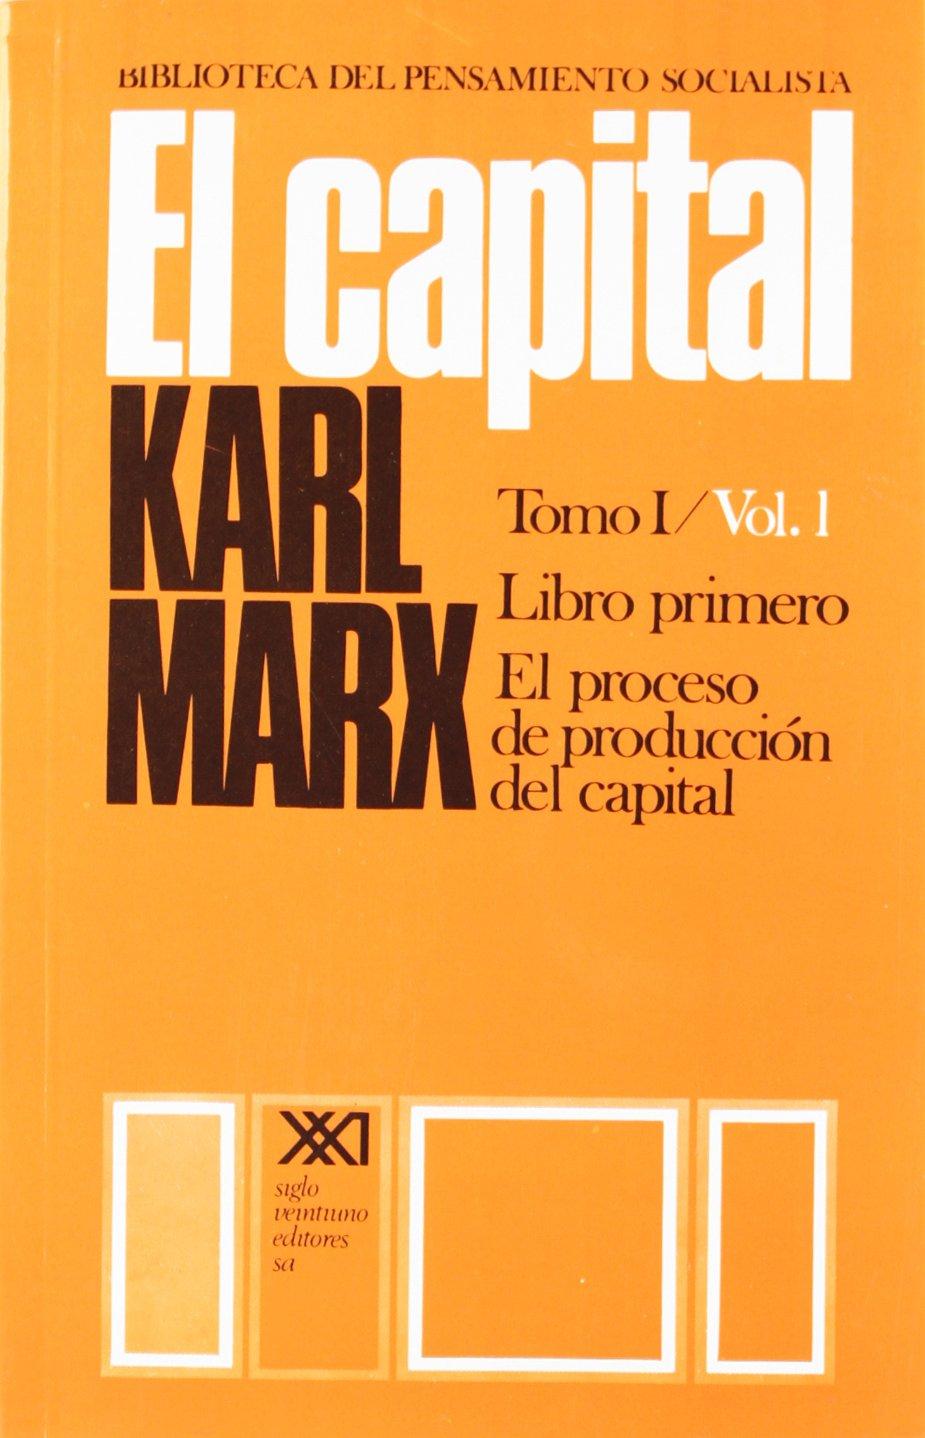 El capital. Libro primero, vol. 1: 0 (Spanish) Paperback – 1 Jan 2001